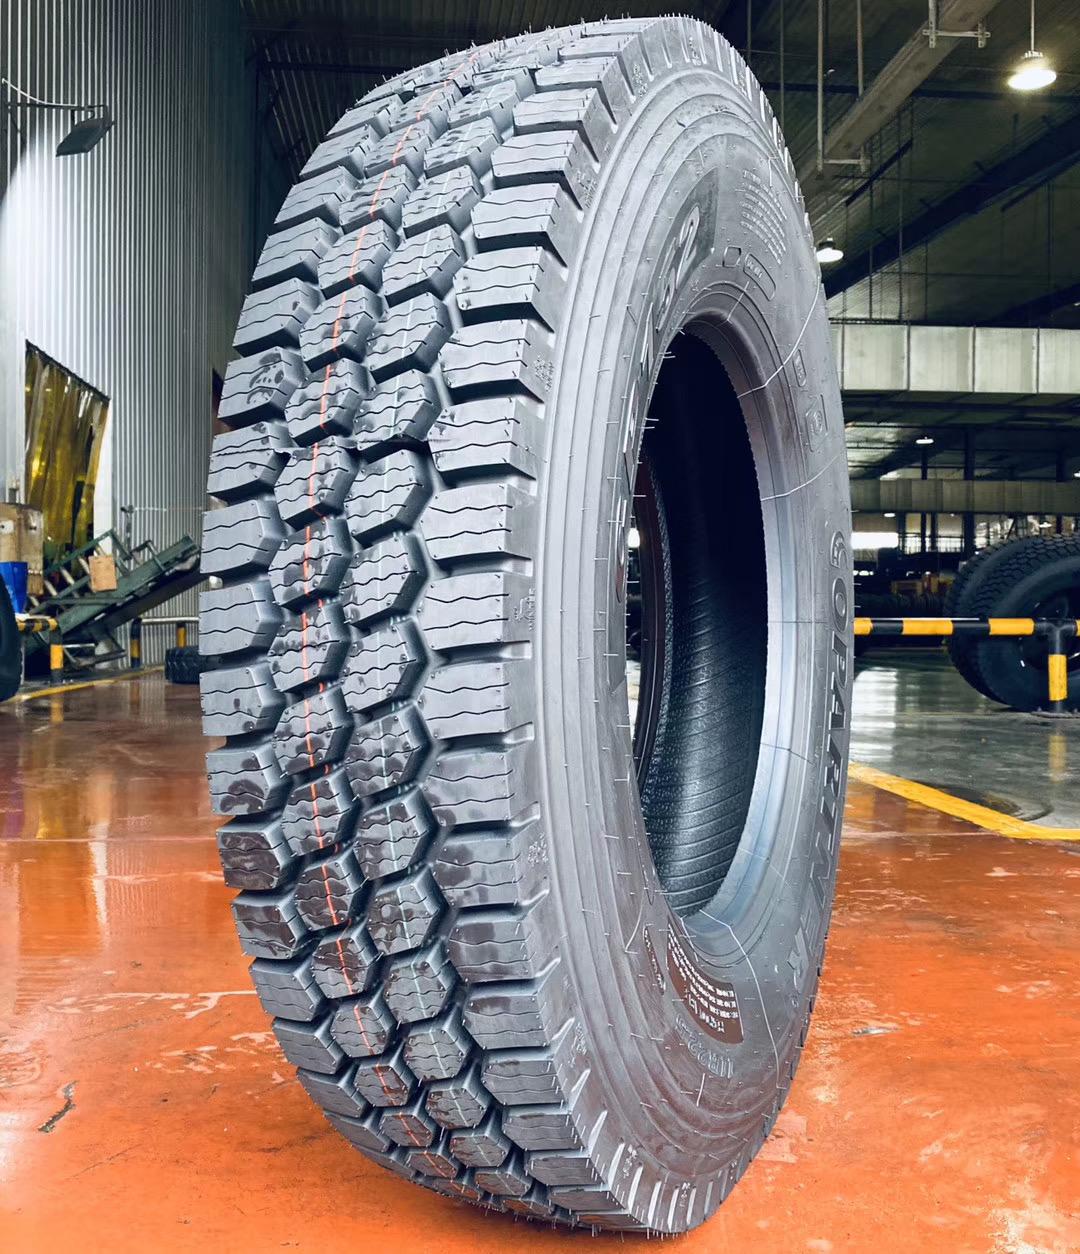 Truck tire service Calgary